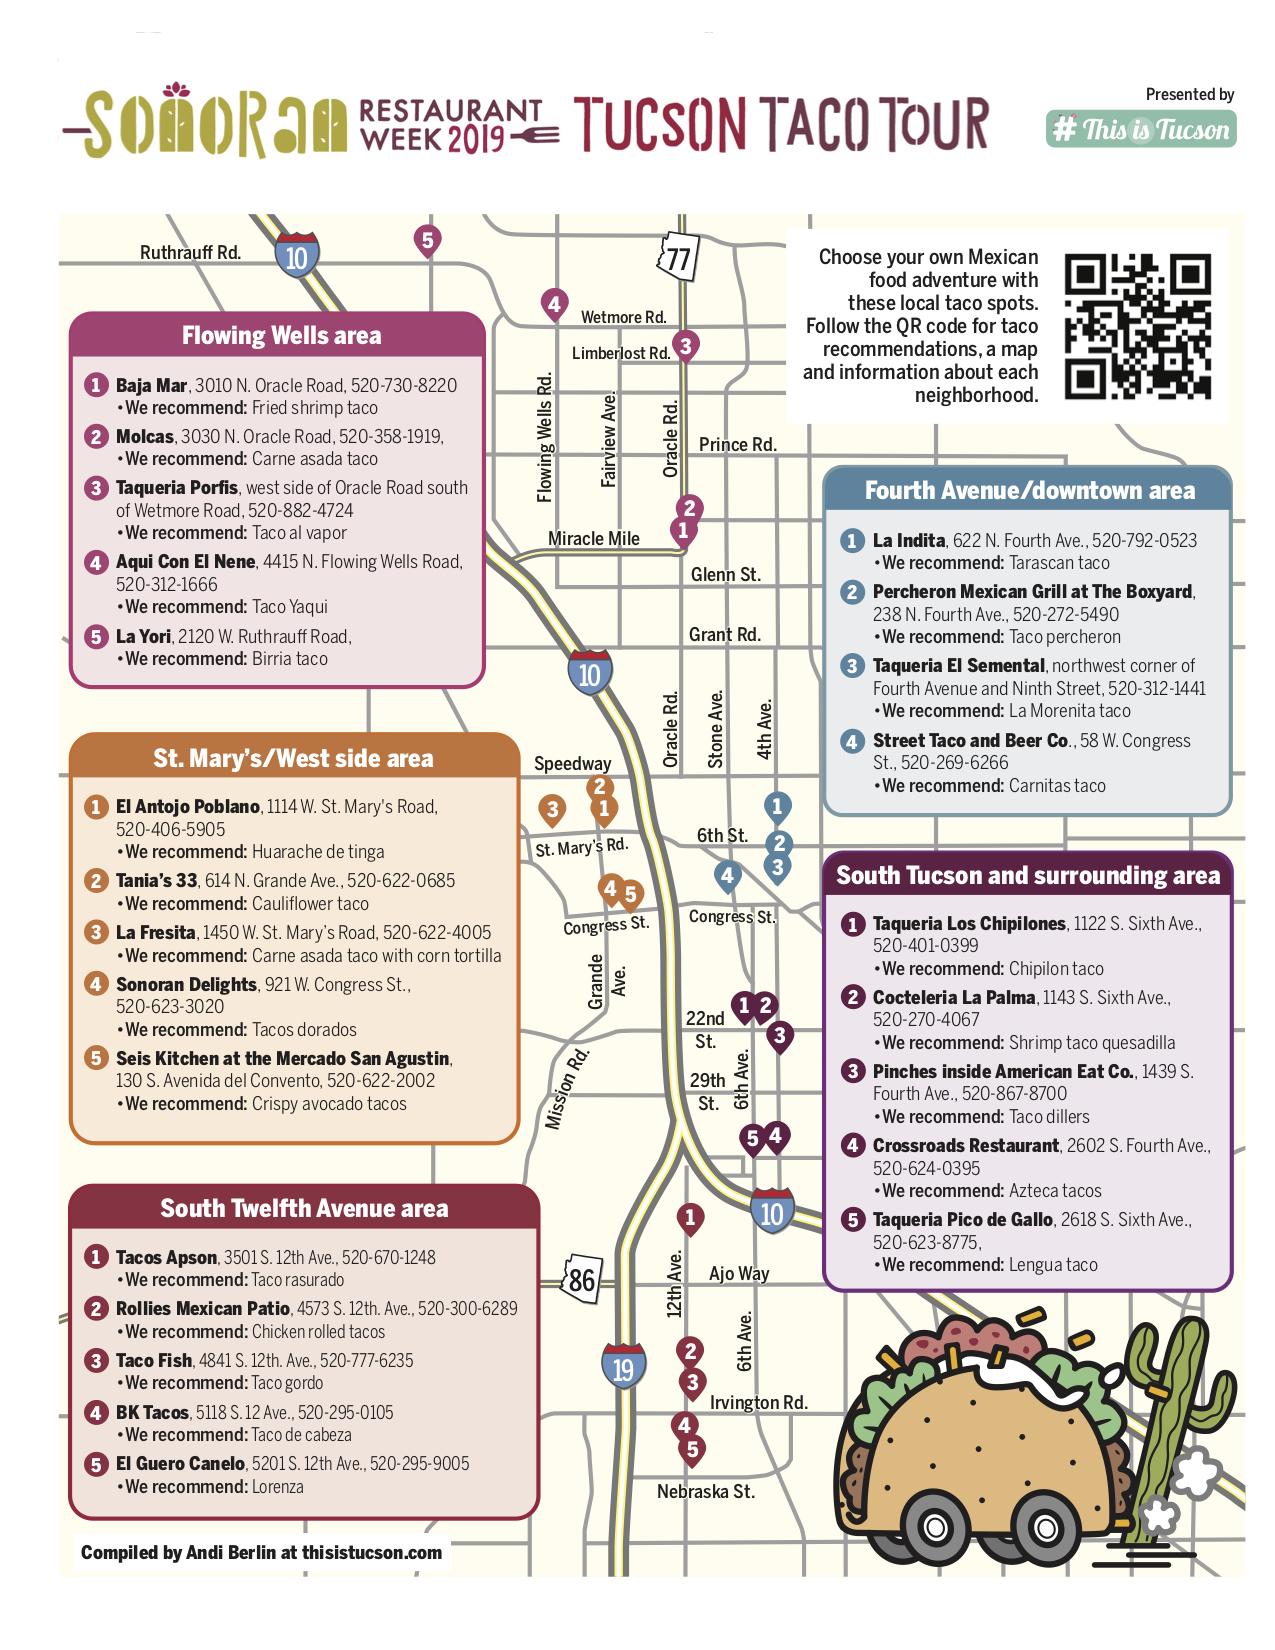 SRW_TucsonTacoTour.jpg